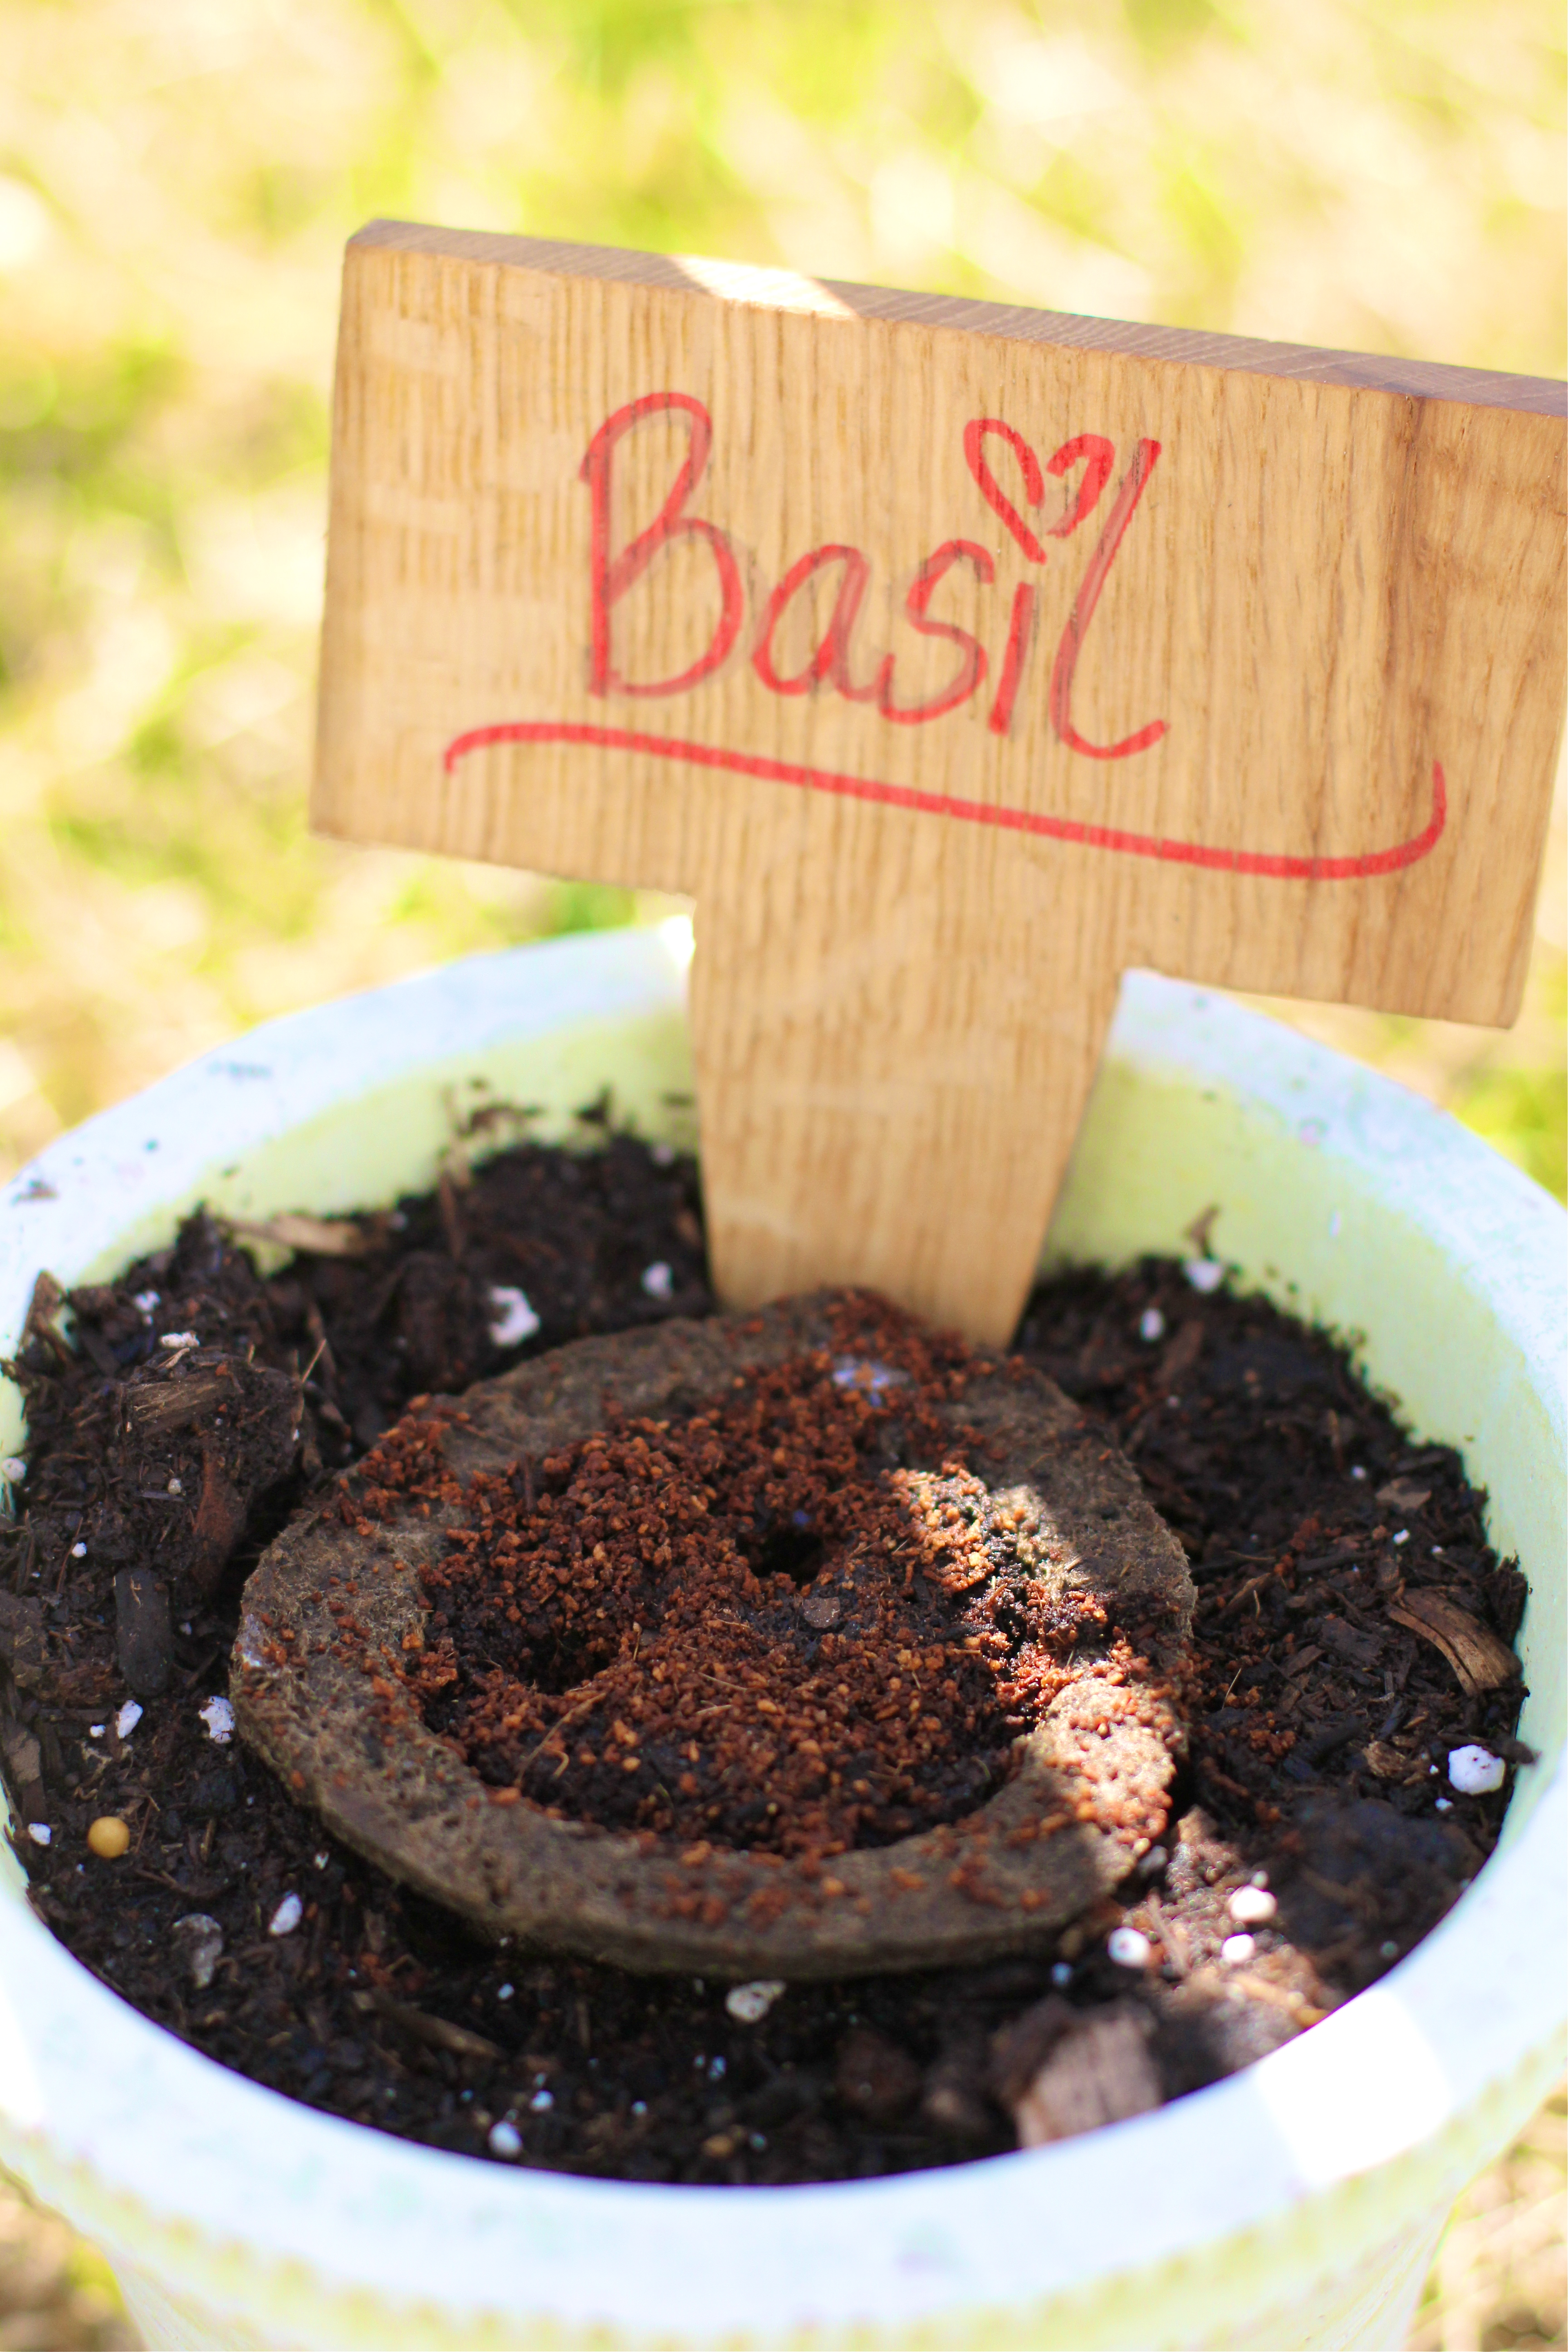 basil-miracle-gro-gro-ables-garden